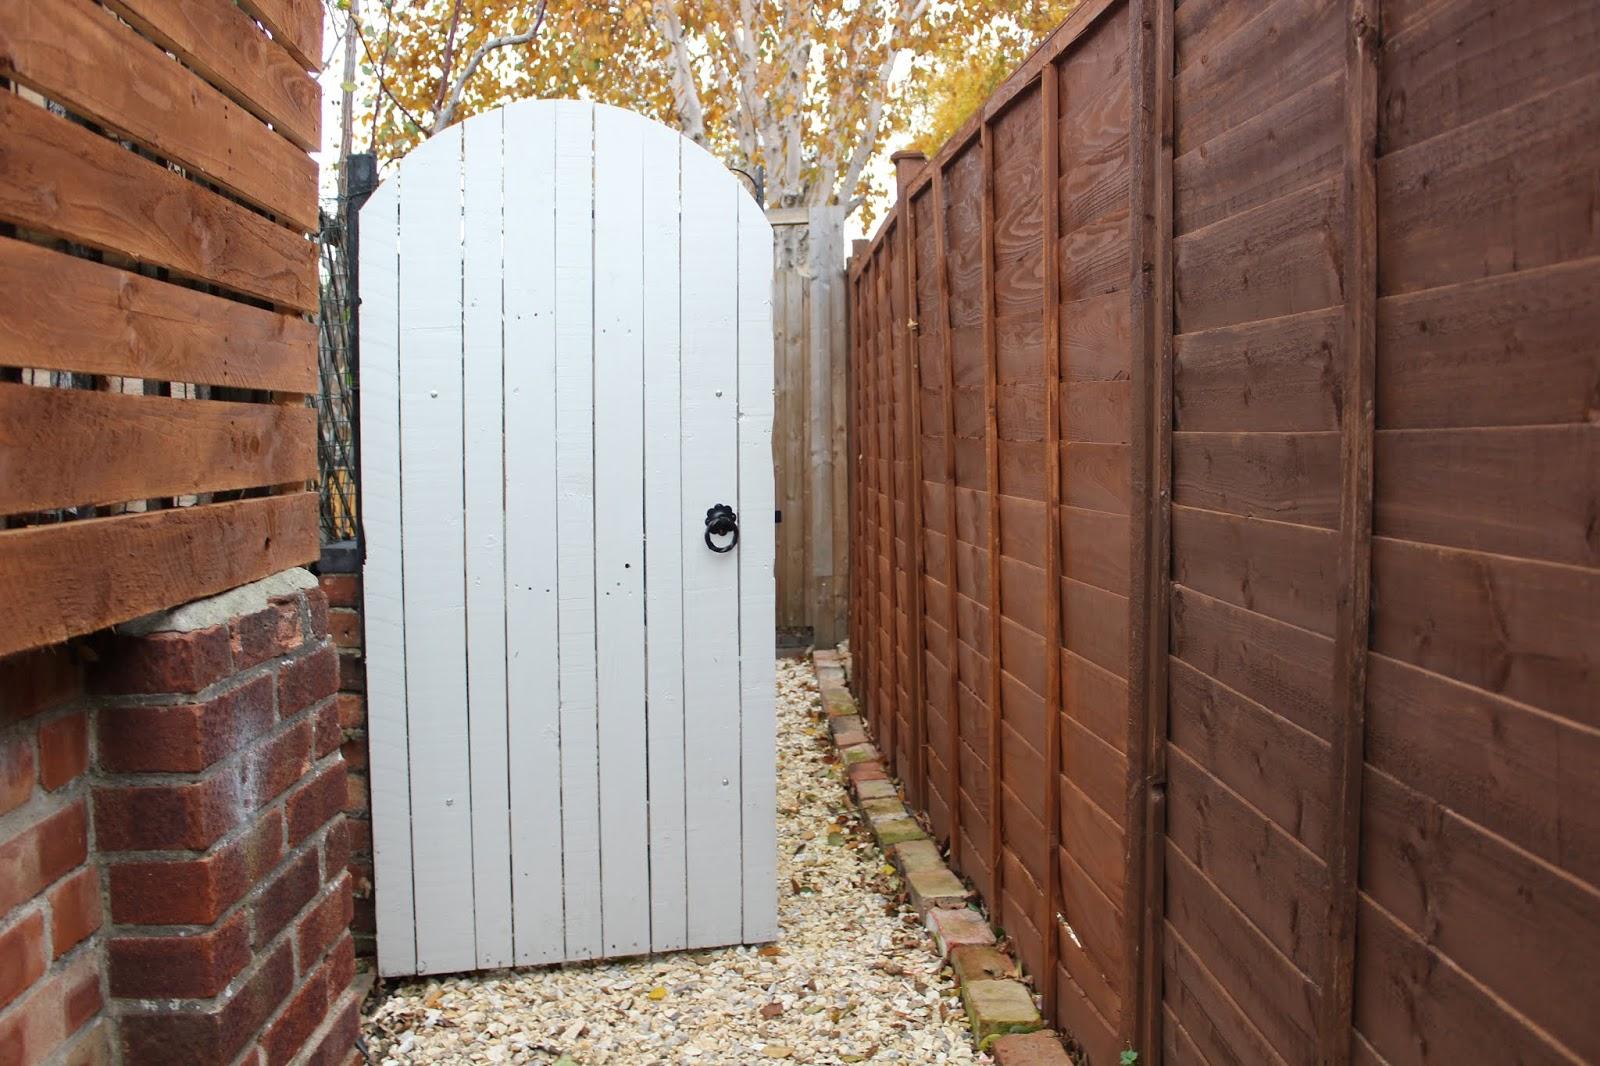 DIY garden gate made from pallet wood